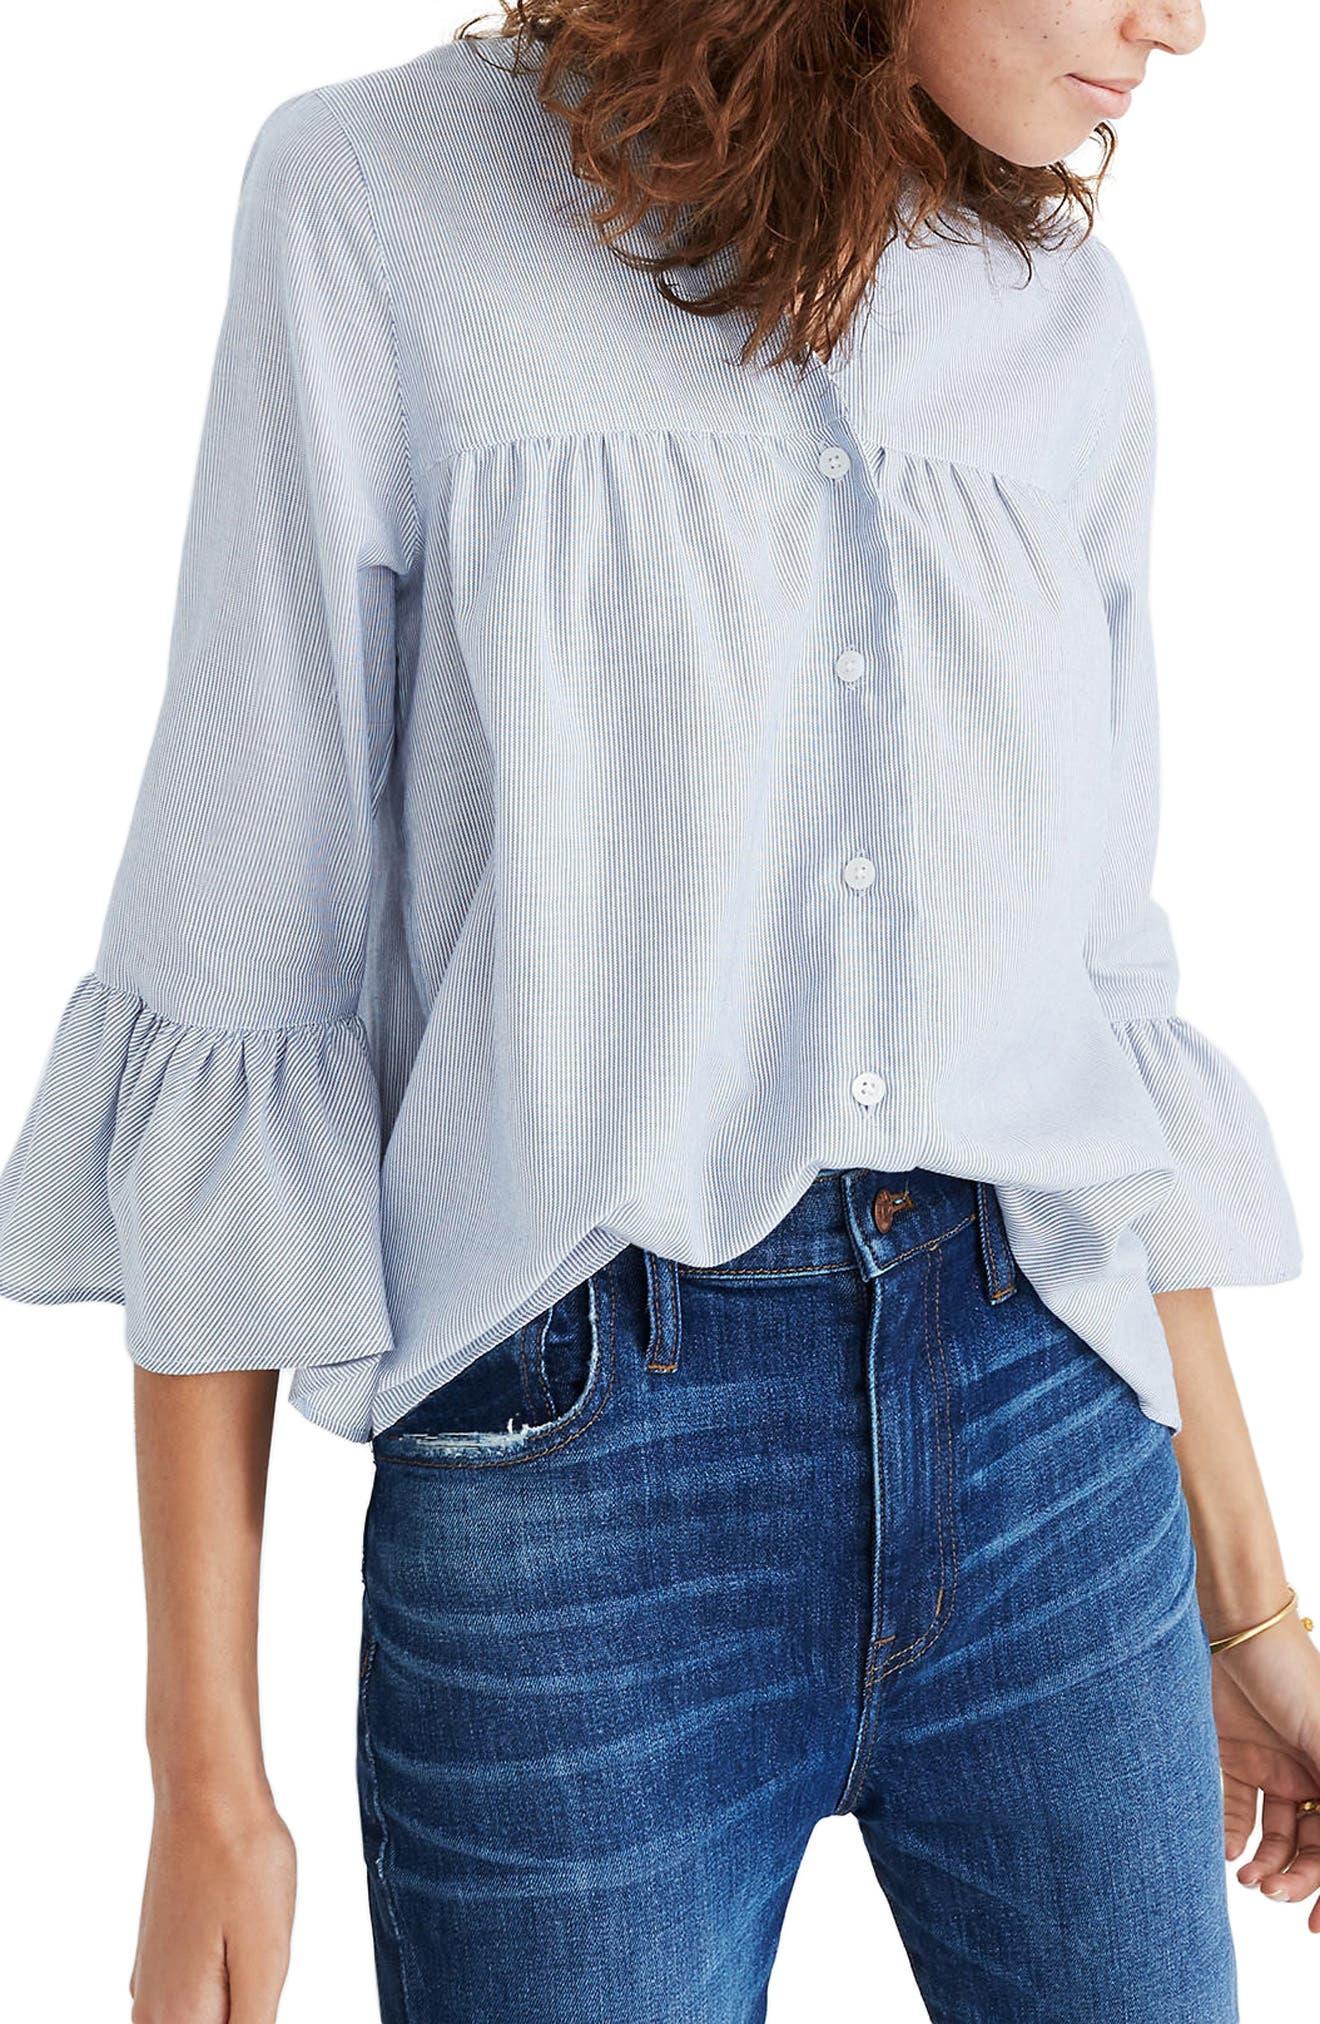 Veranda Bell Sleeve Shirt,                         Main,                         color,